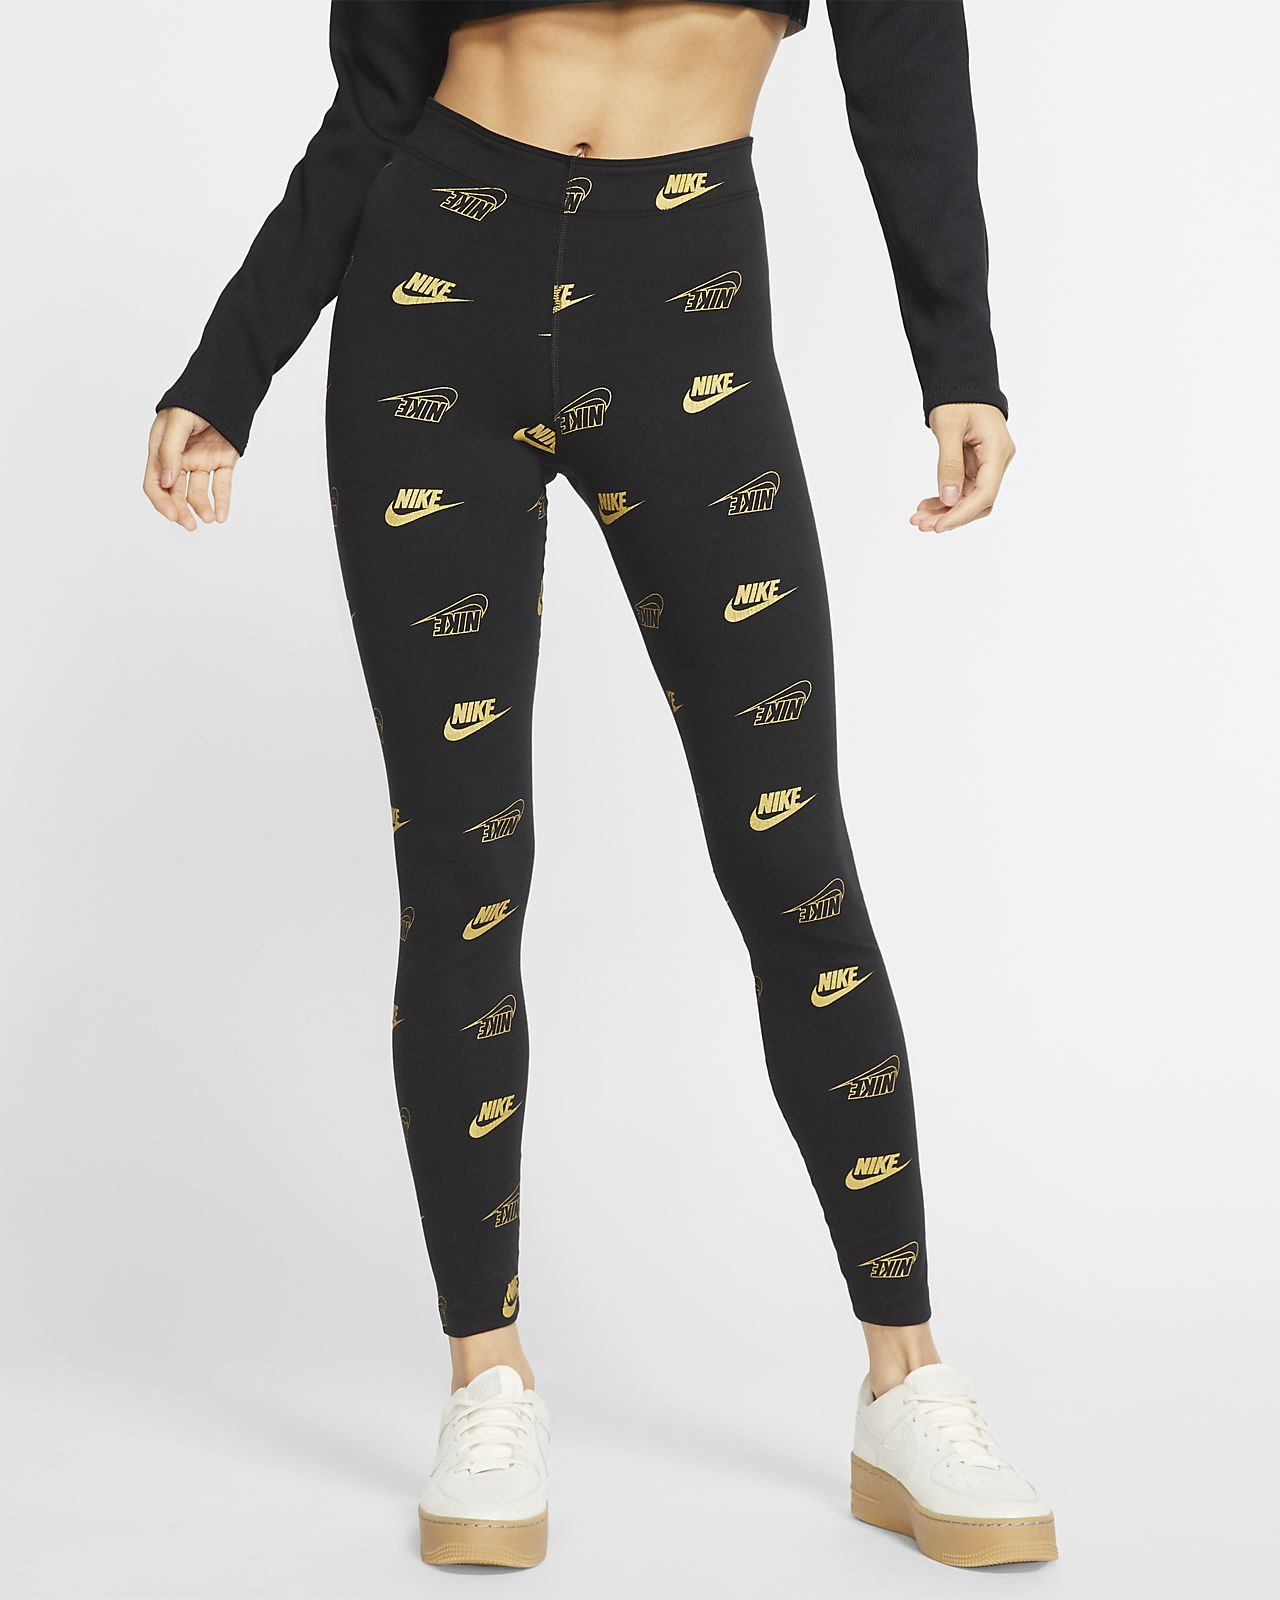 Nike Sportswear Damen-Leggings mit Print